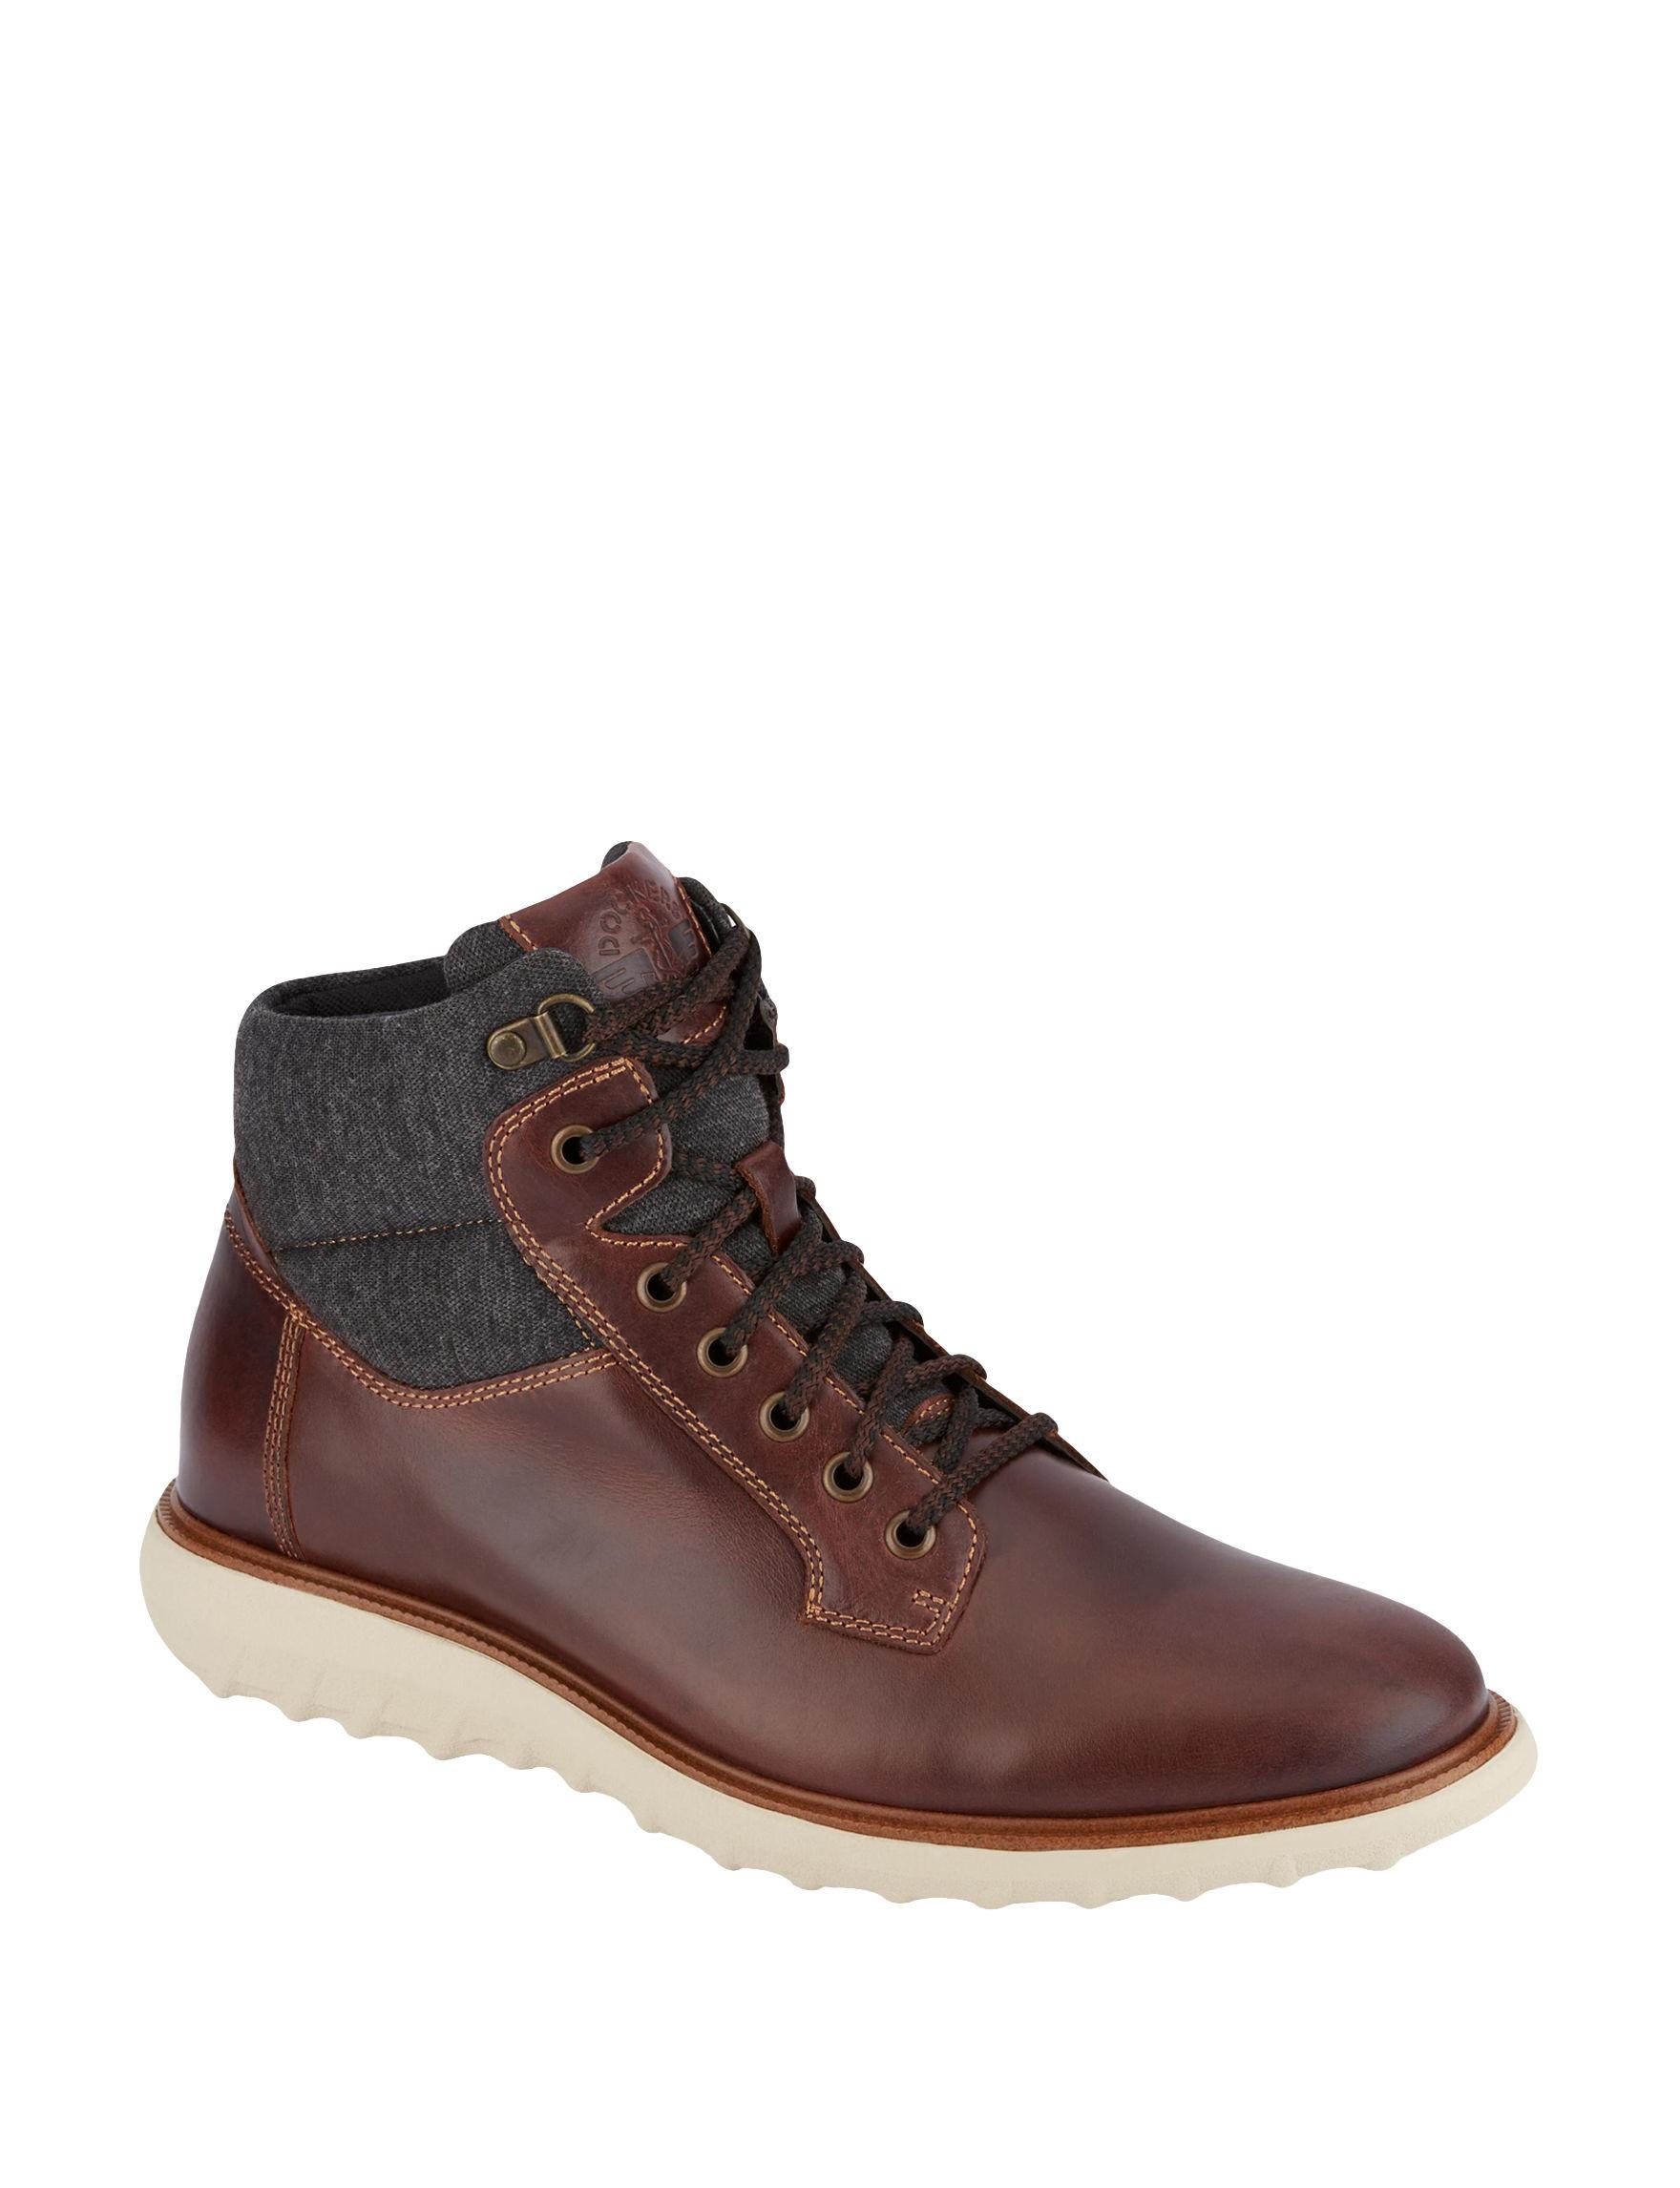 Dockers Brown / Grey